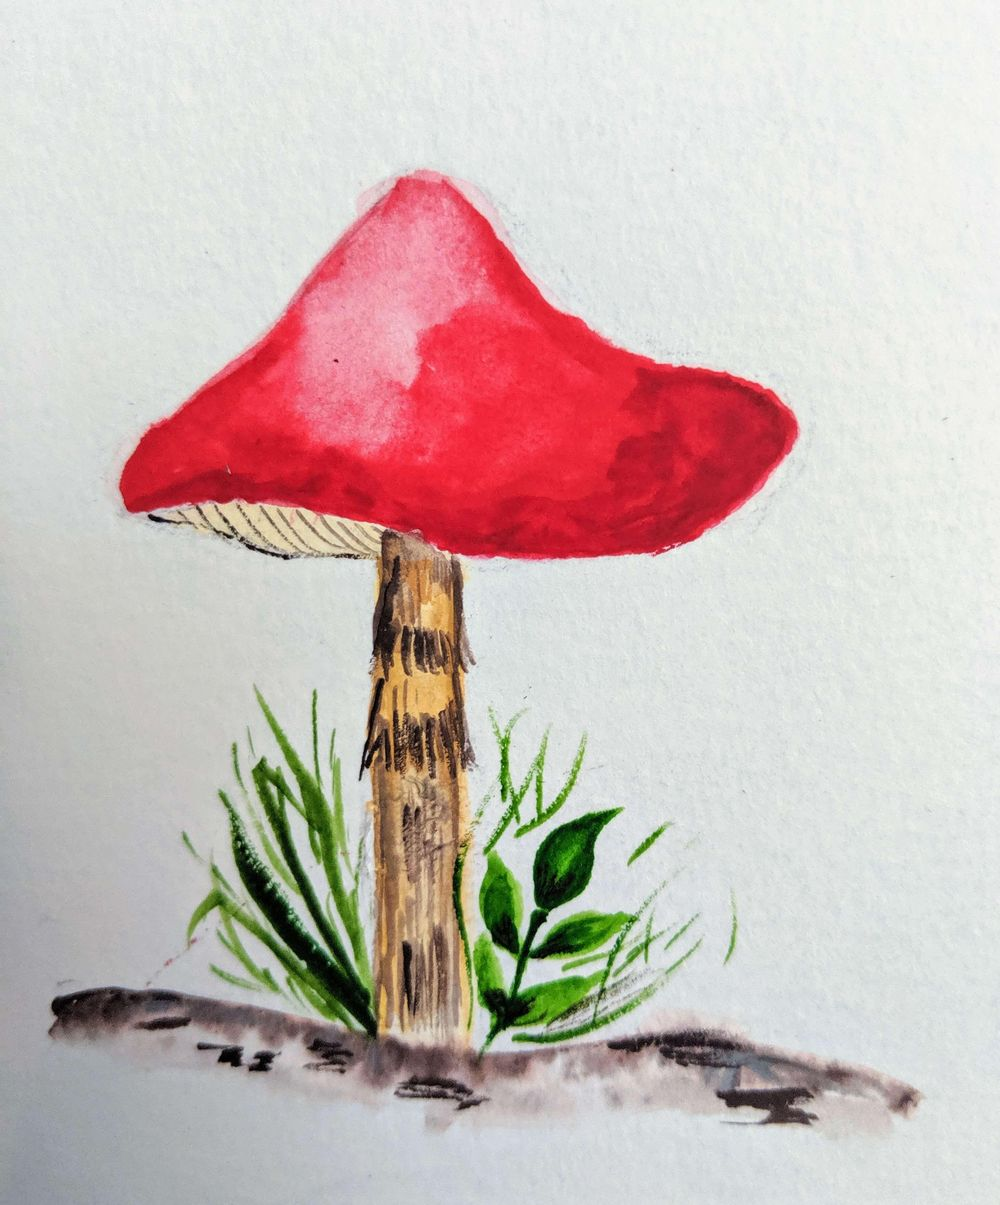 Love Mushrooms :-) - image 3 - student project